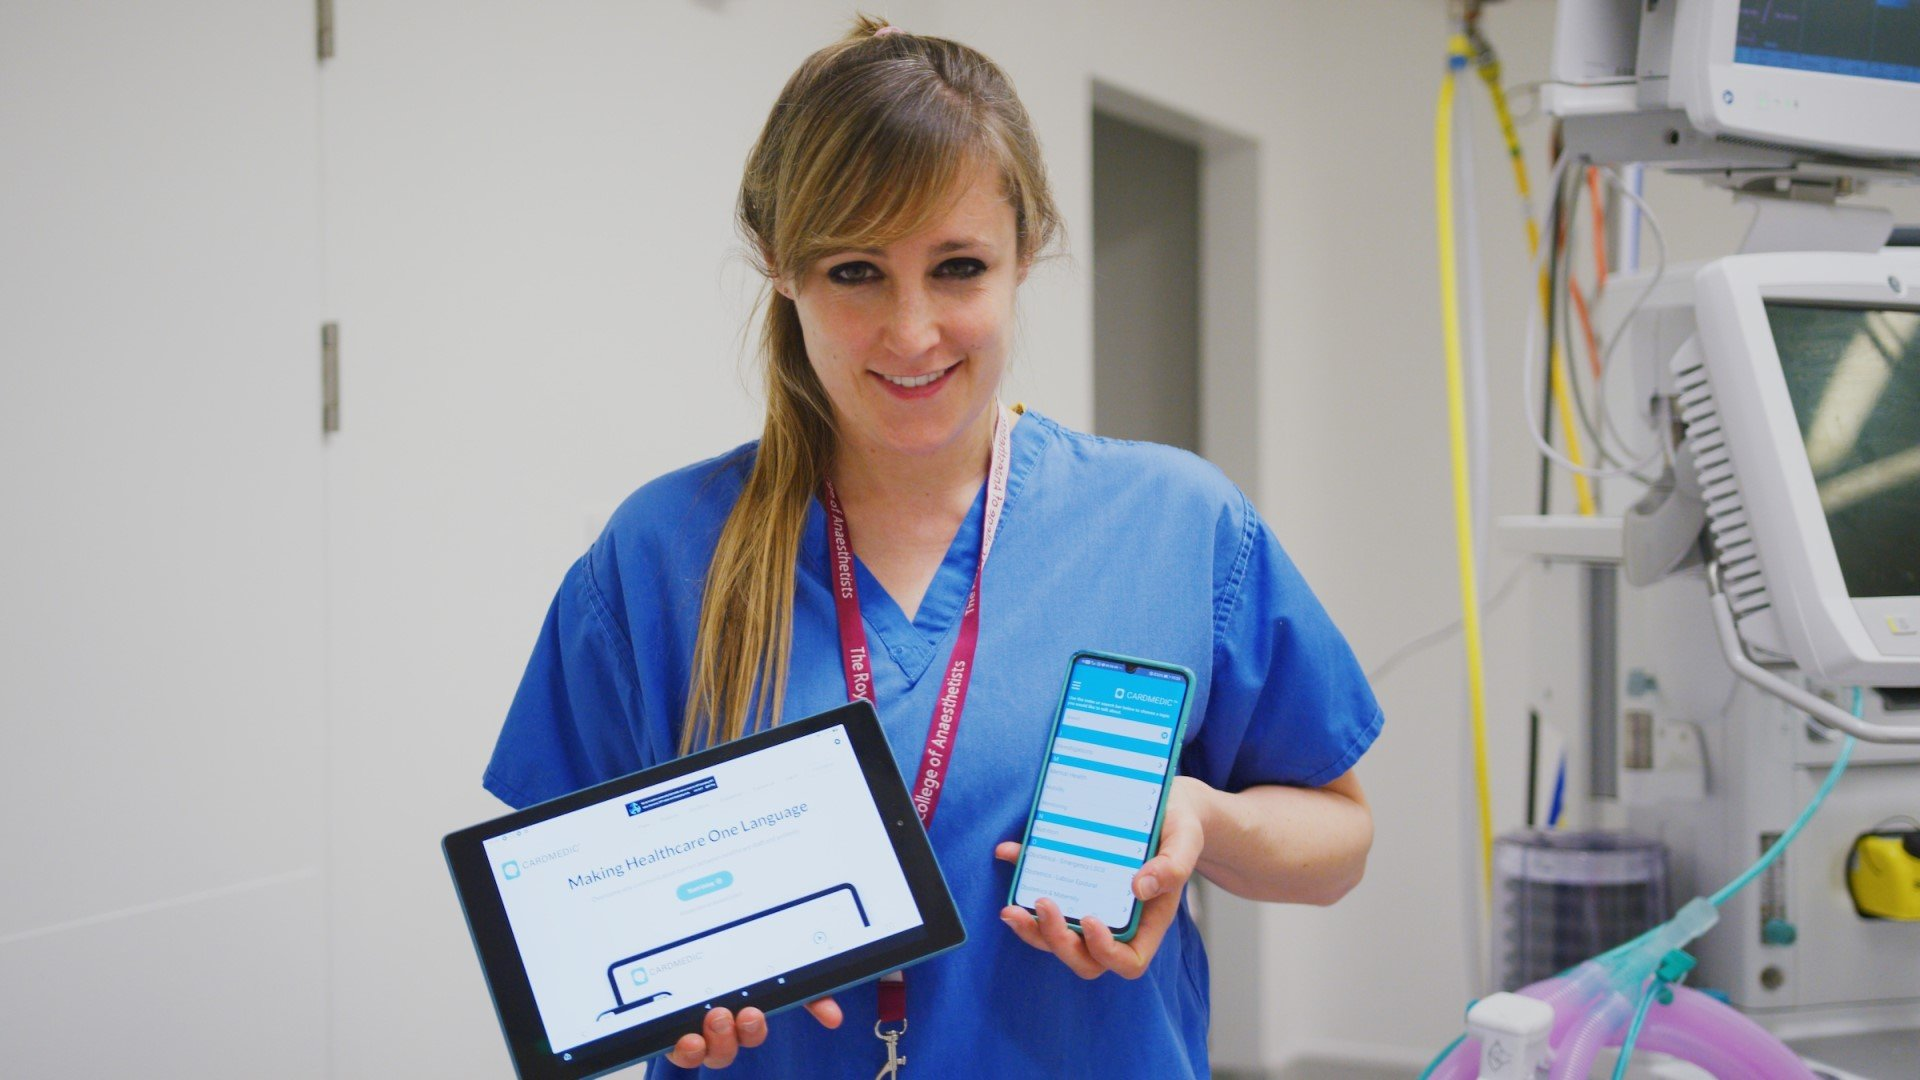 Rachael Grimaldi with the CardMedic App